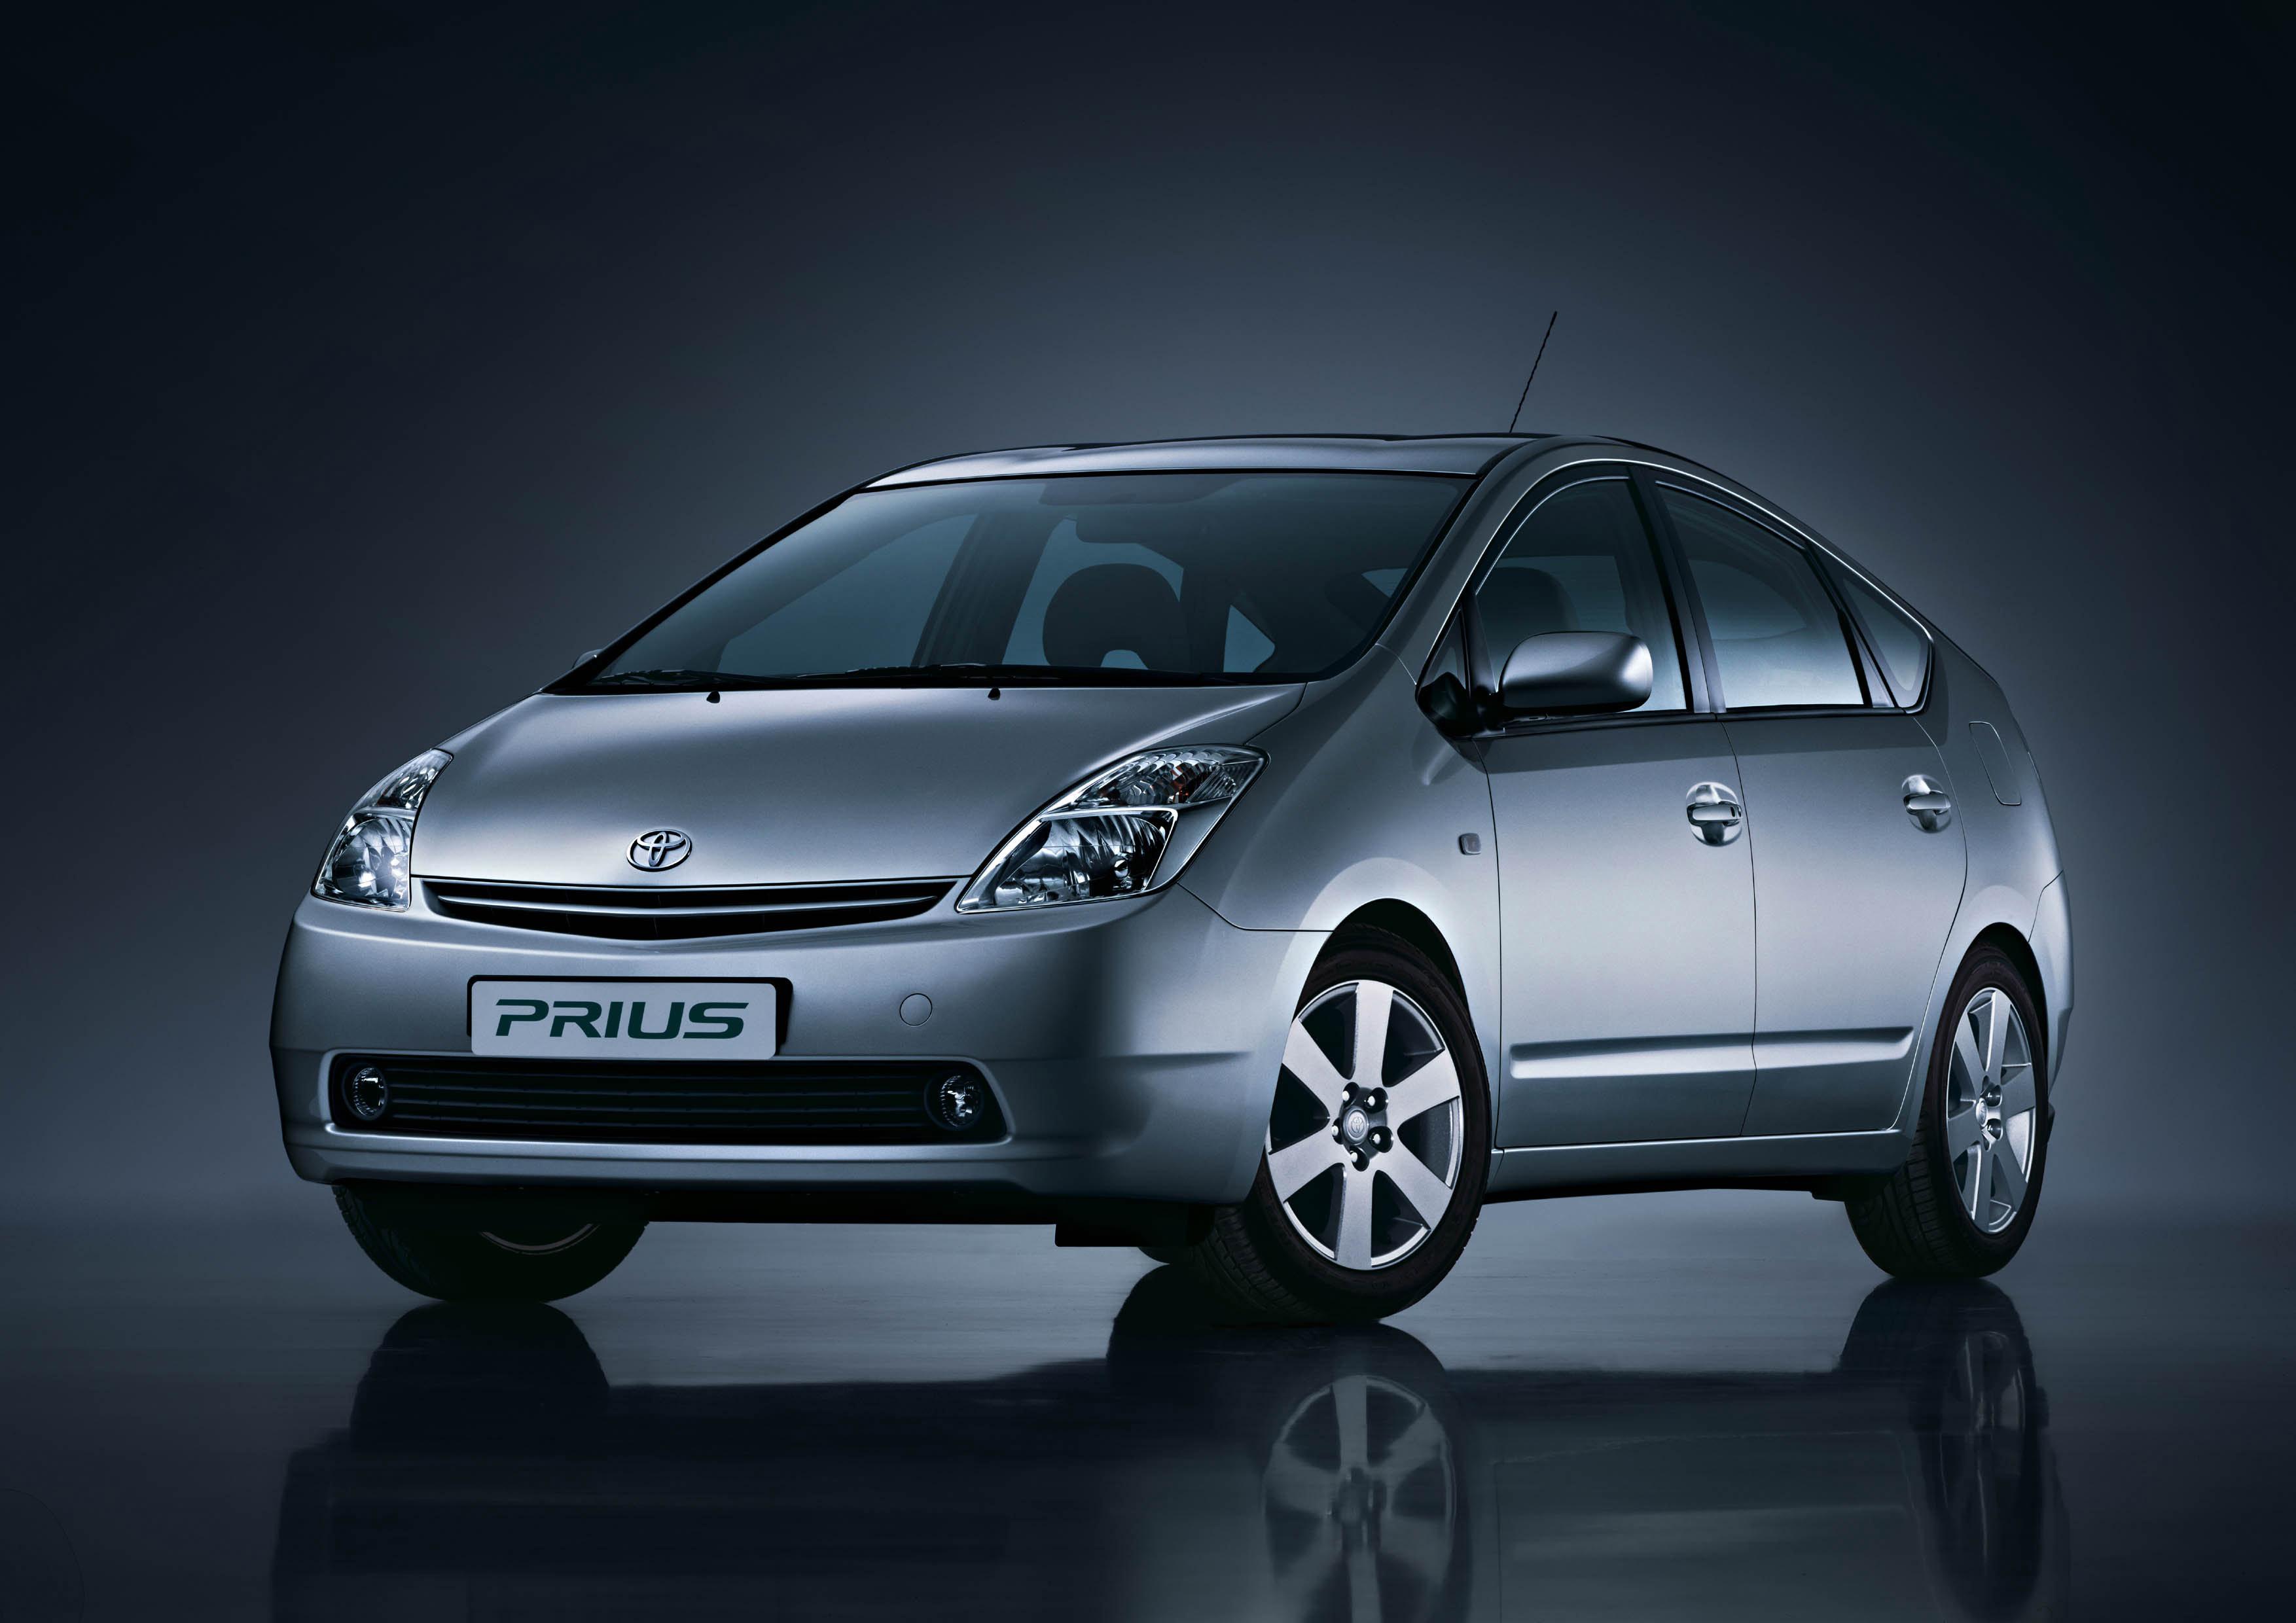 Toyota Prius HD Pictures Automobilesreview - 2003 prius